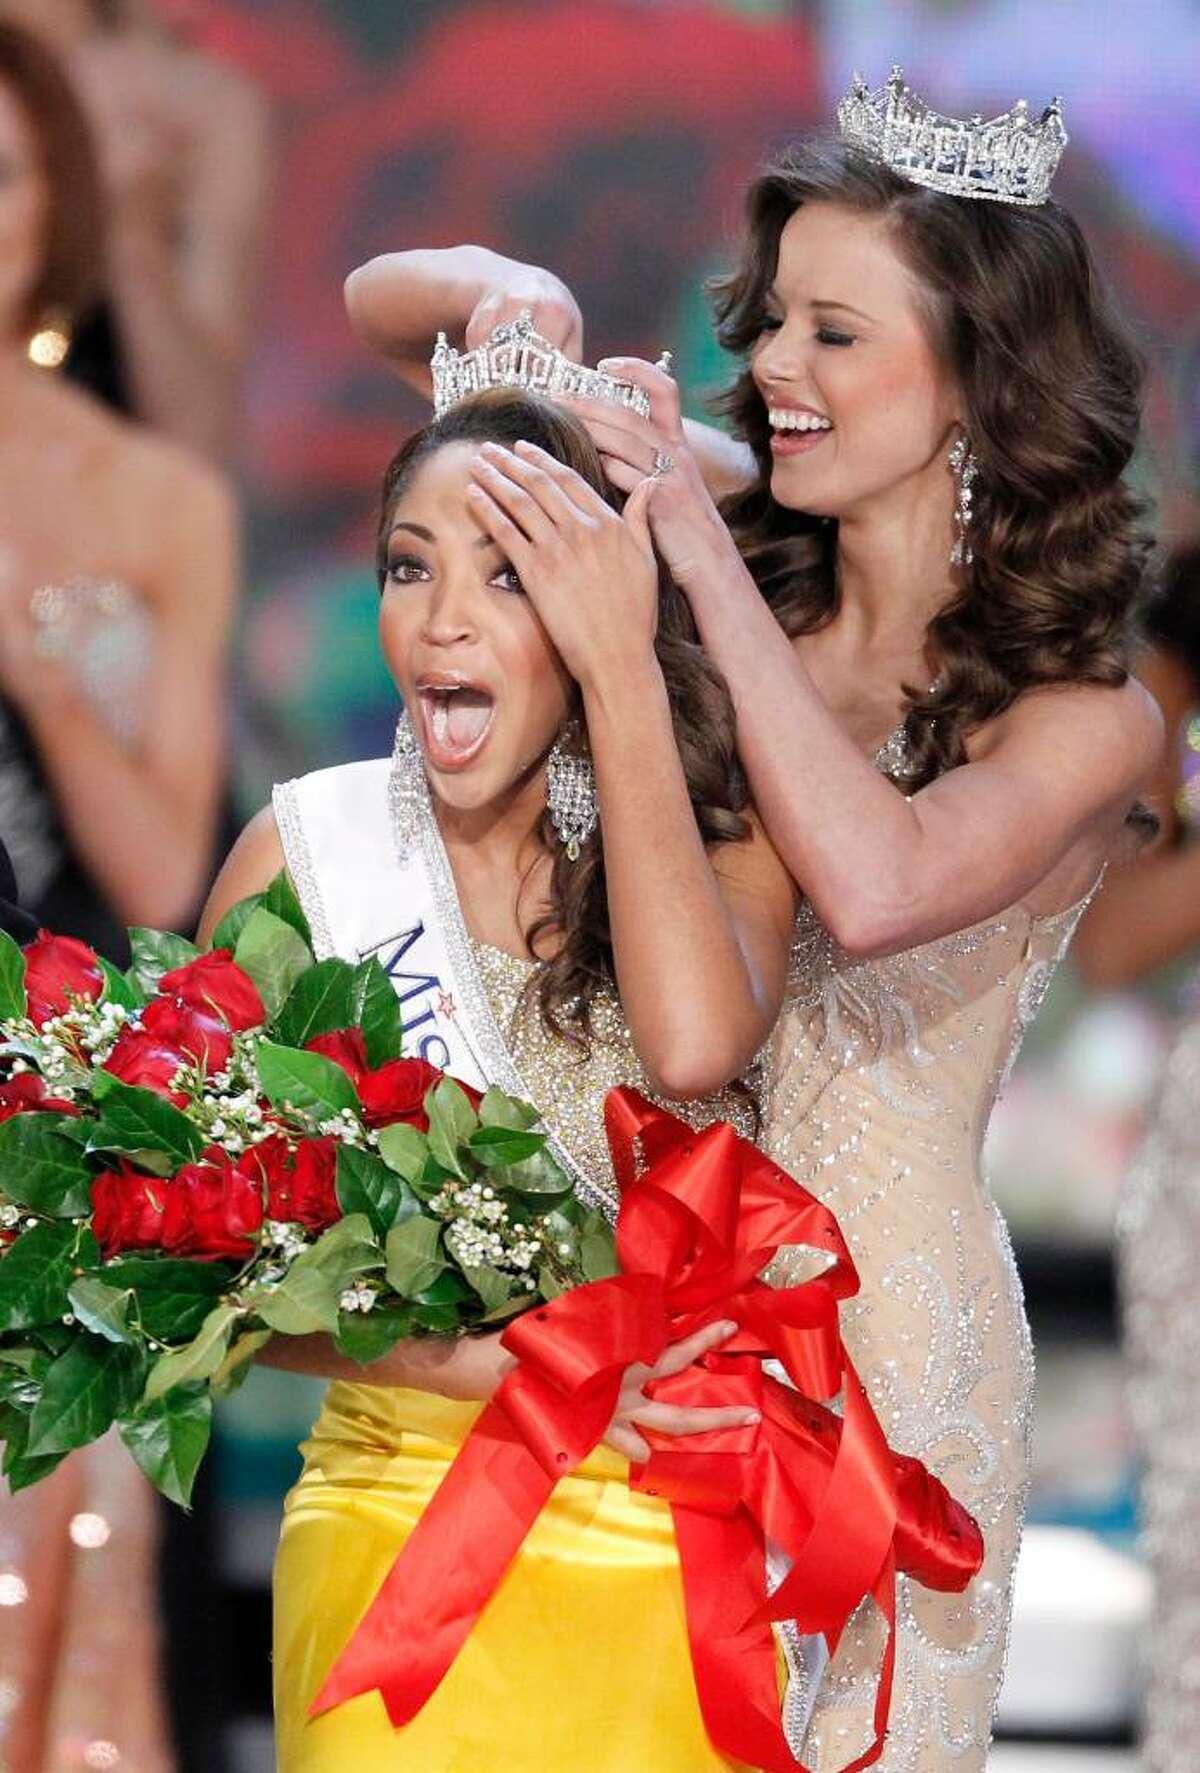 Miss Virginia Caressa Cameron reacts after being crowned Miss America by Katie Stam Miss America 2009, Saturday Jan. 30, 2010 in Las Vegas. (AP Photo/Eric Jamison)